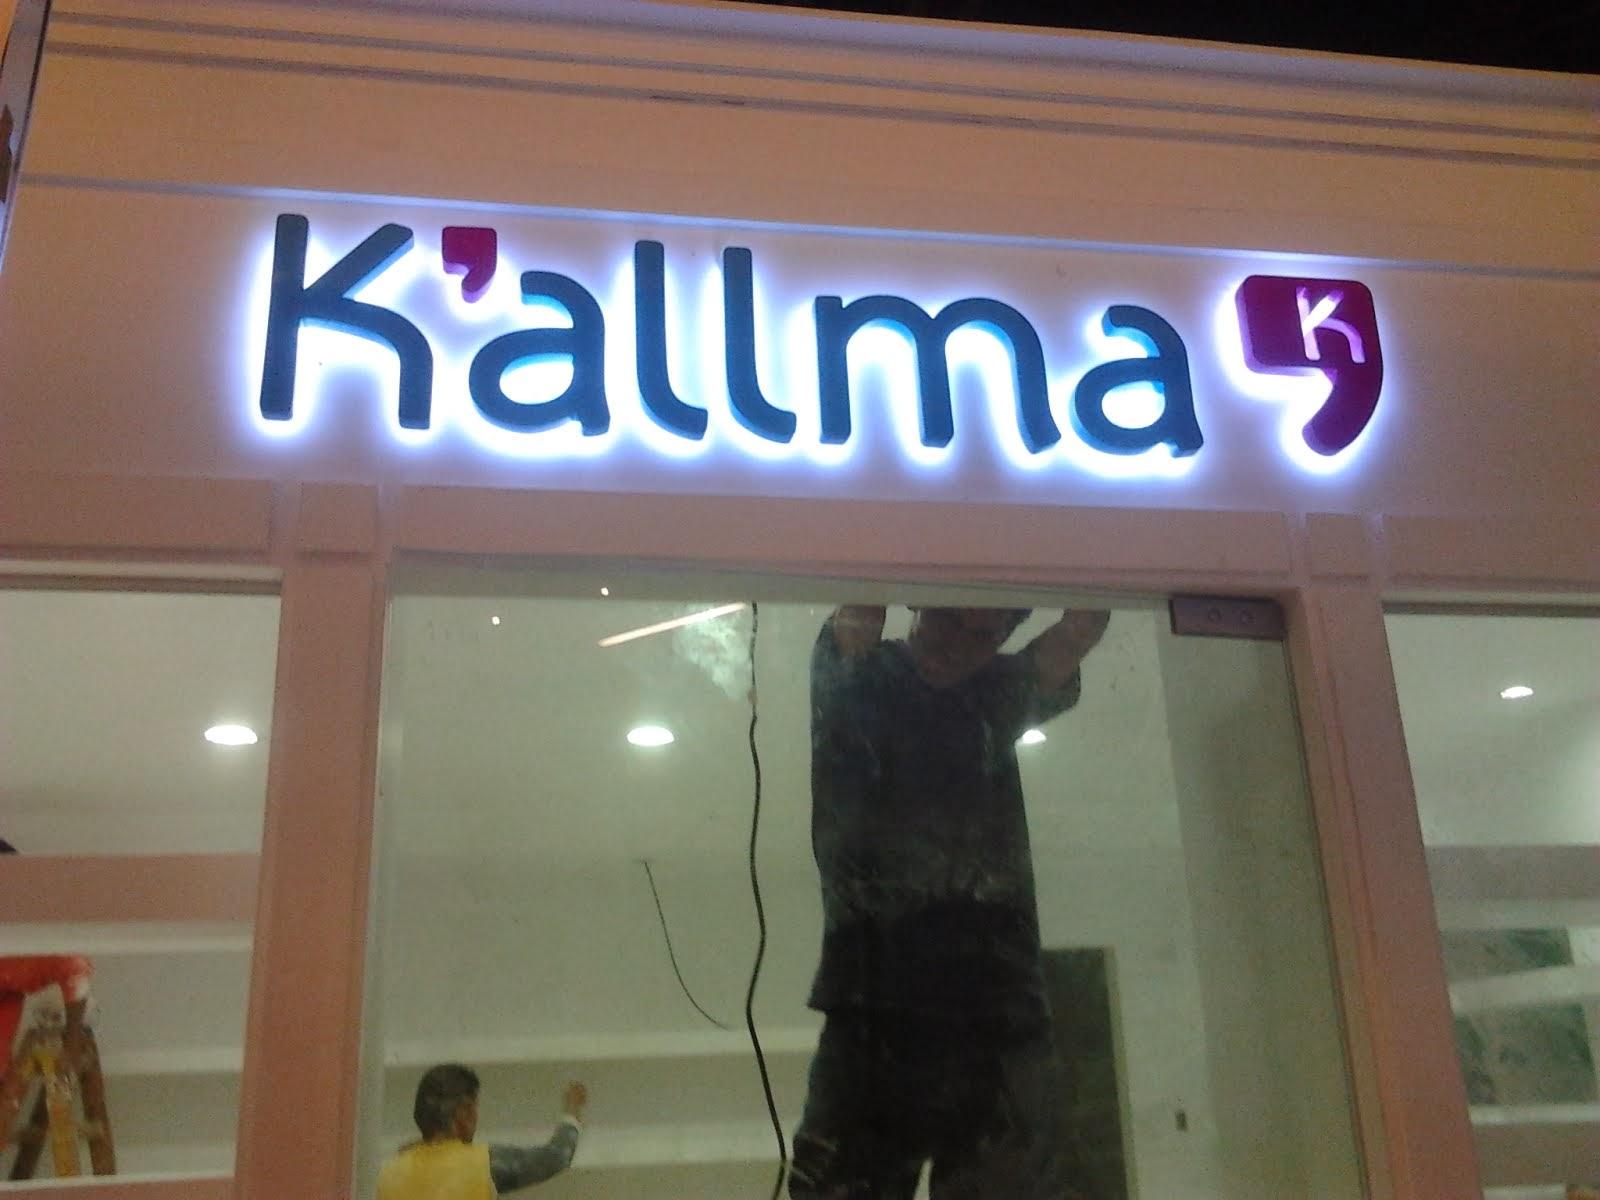 kallma - LETRERO EN POLIURETANO RETROILUMINADO